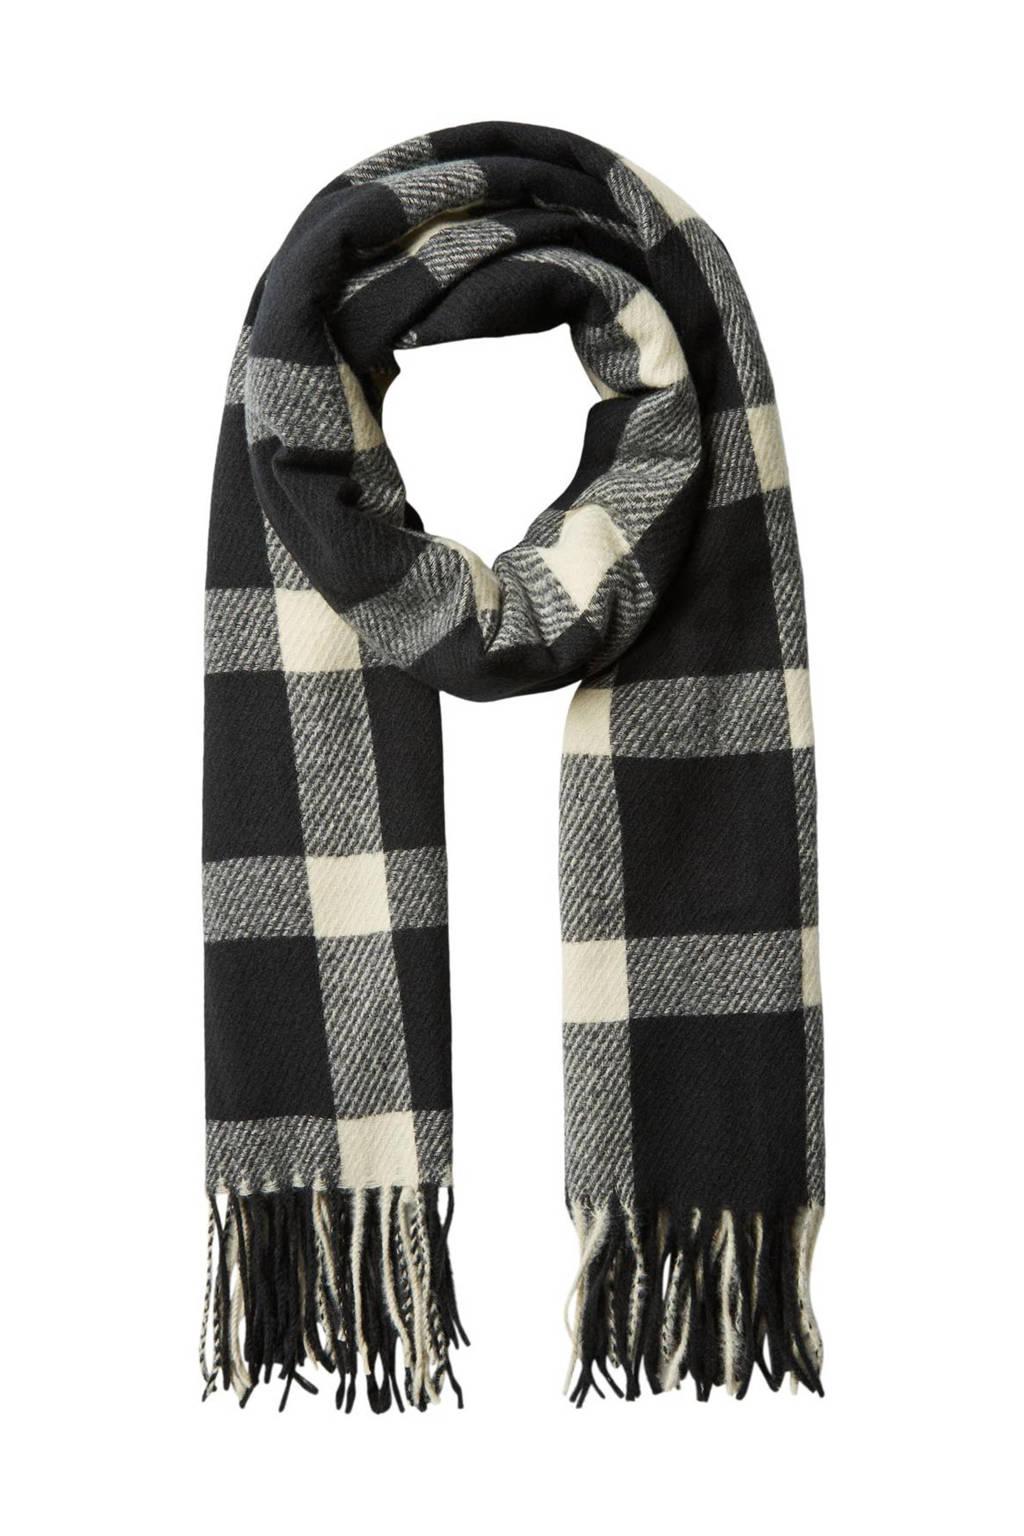 VERO MODA geruite sjaal VMDABIA zwart/ecru, Zwart/ecru